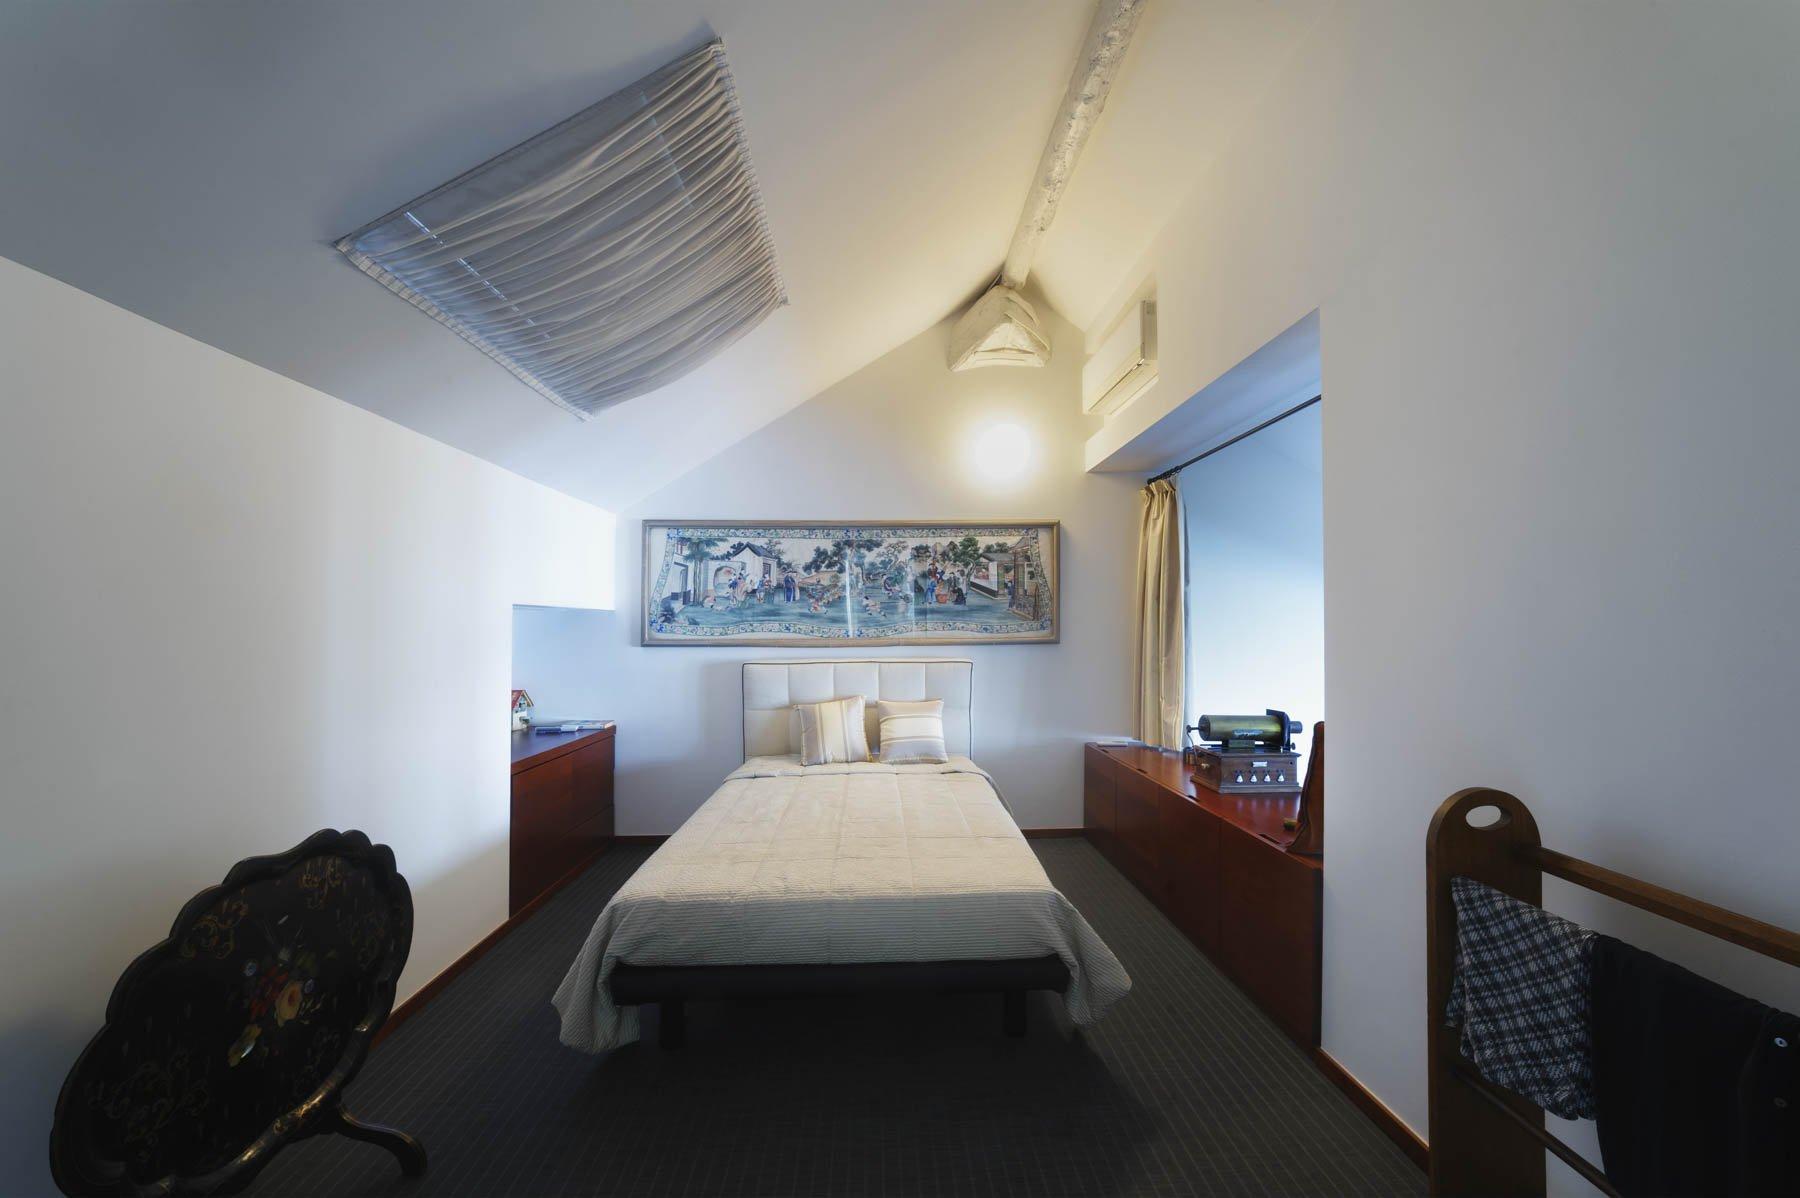 Apartment for sale in Baveno, inside a historic lake front villa - master bedroom